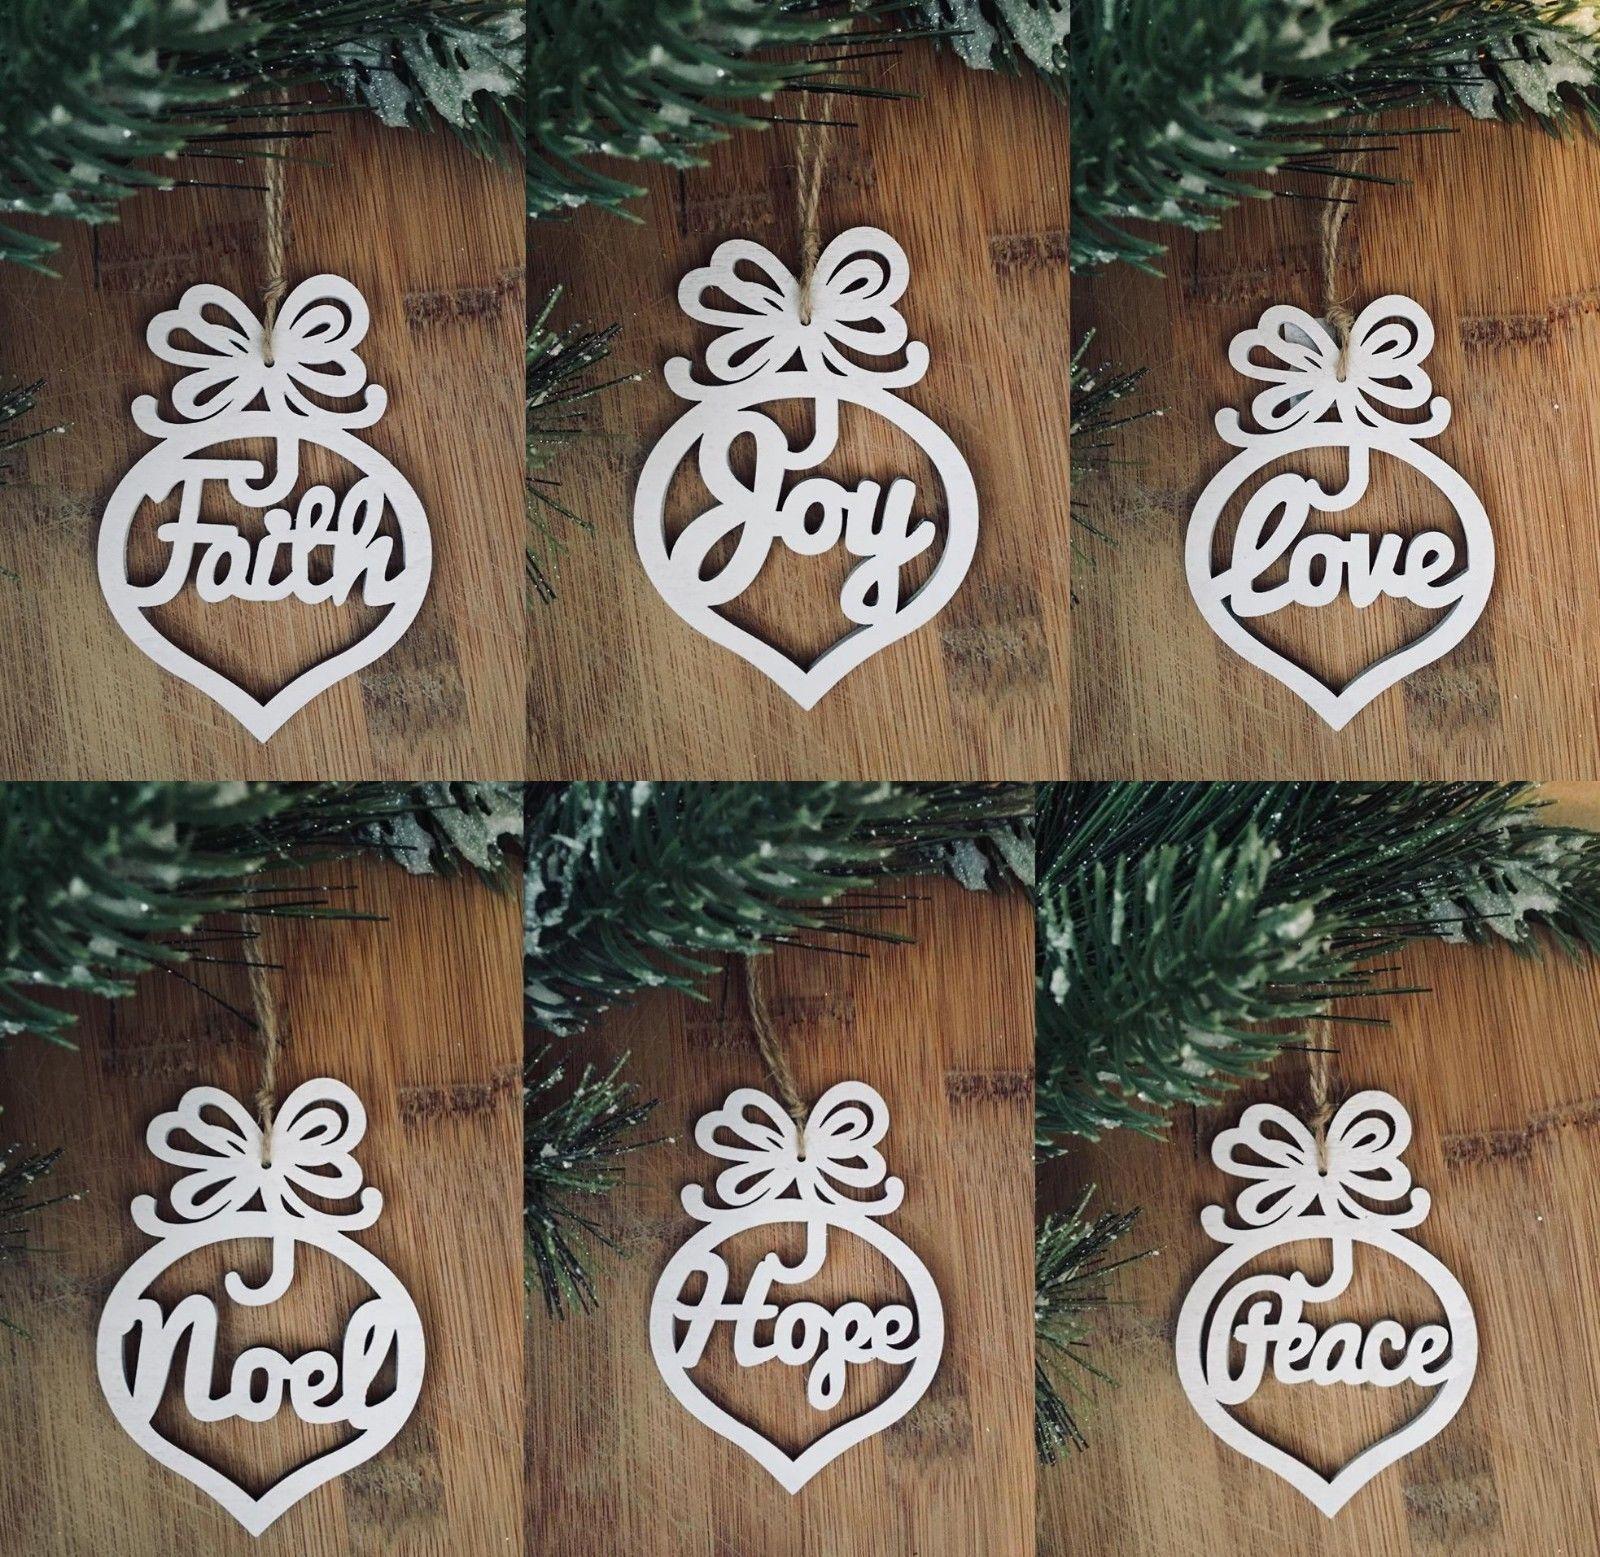 6x rustic wooden white Nordic hanging xmas decoration NOEL PEACE HOPE JOY FAITH